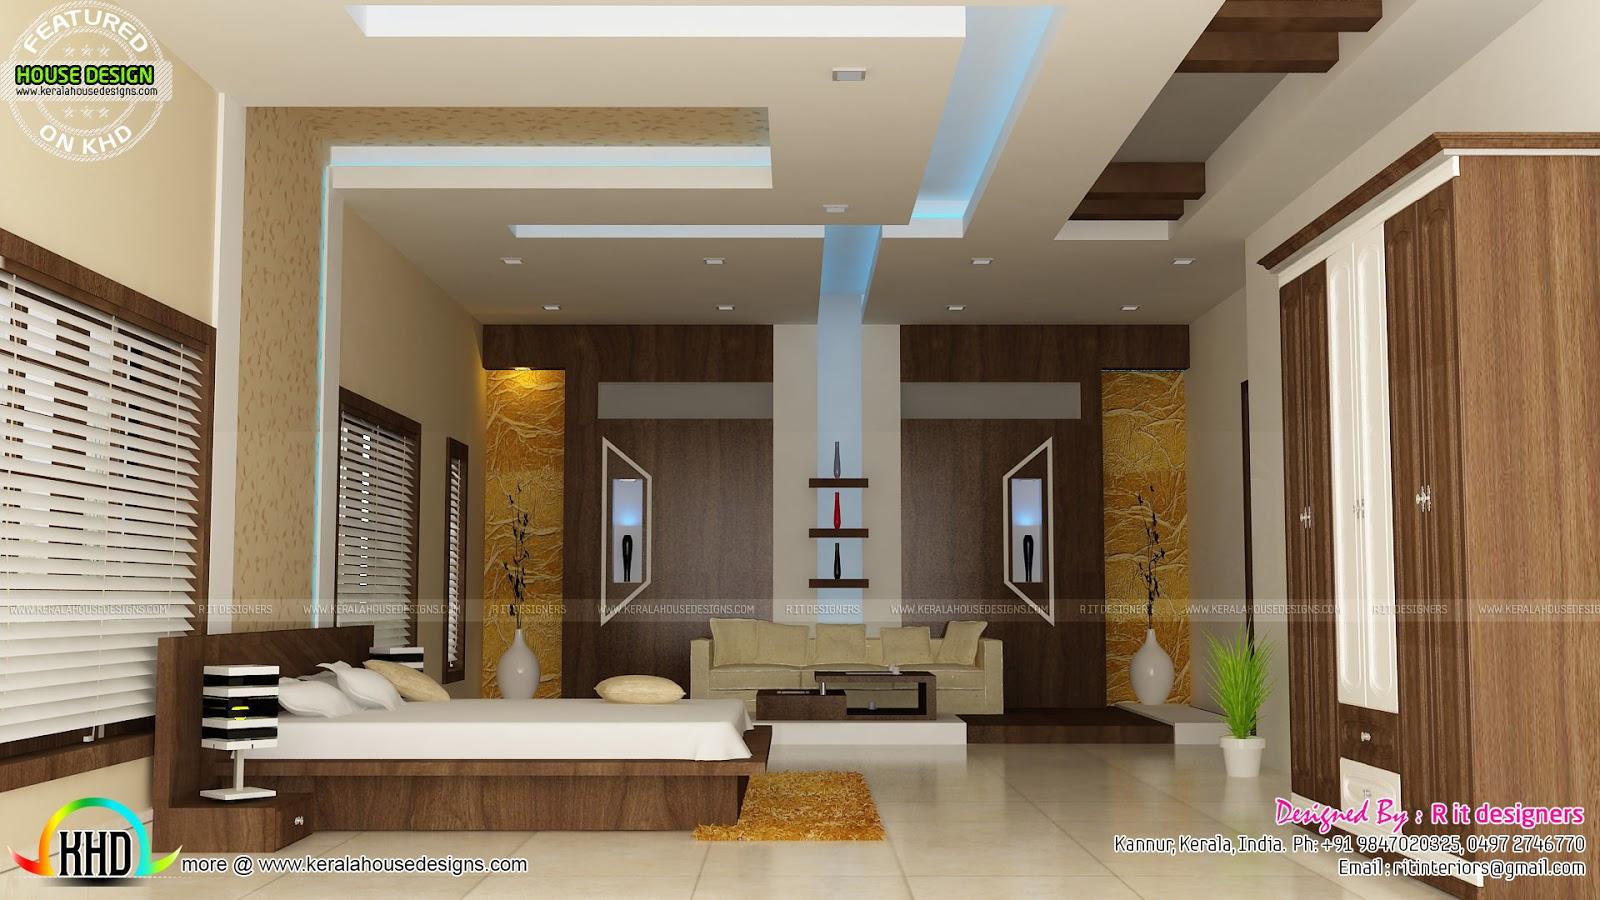 R It Designers (home Design In Kannur) Part - 24: Living Room Master Bedroom Bedroom Interior Bedroom Interior. R It Designers